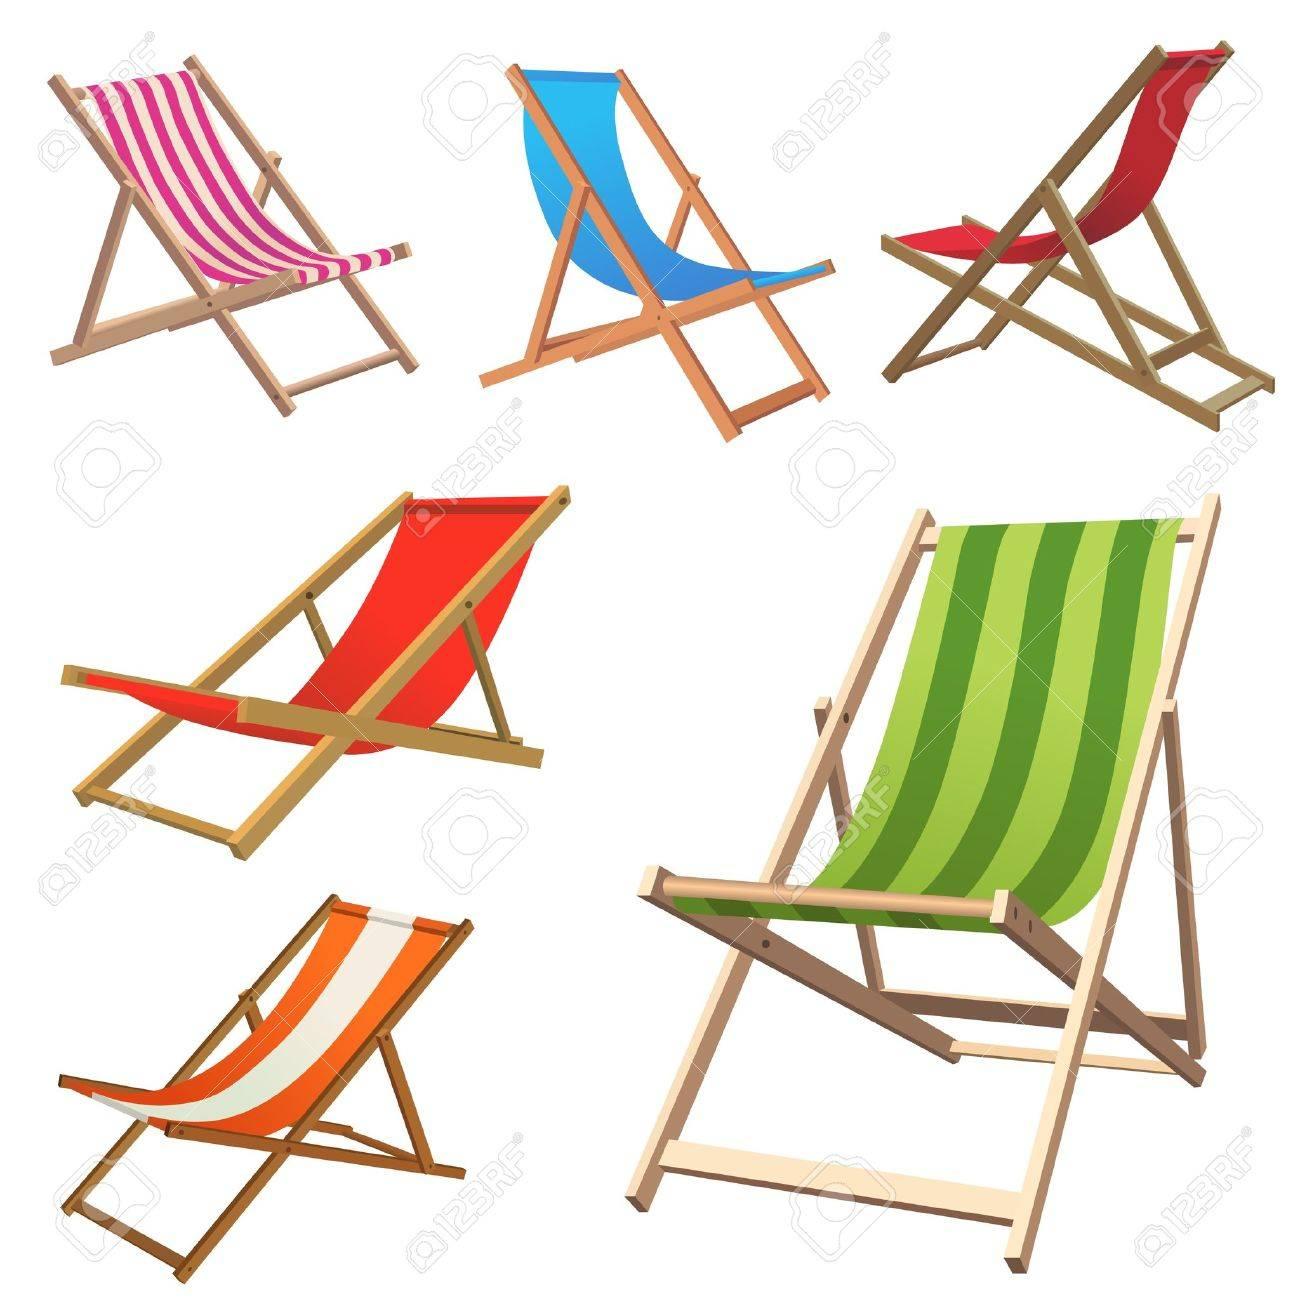 Beach chair drawing - Beach Chair Beach Chair